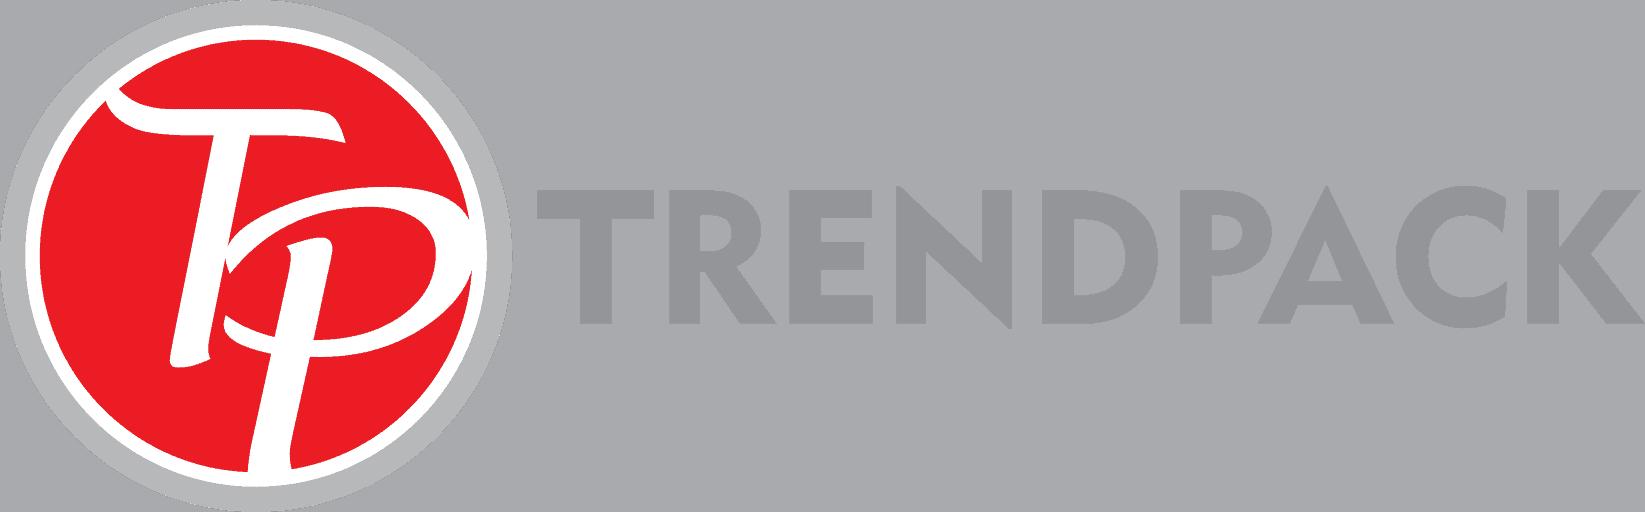 Trendpack